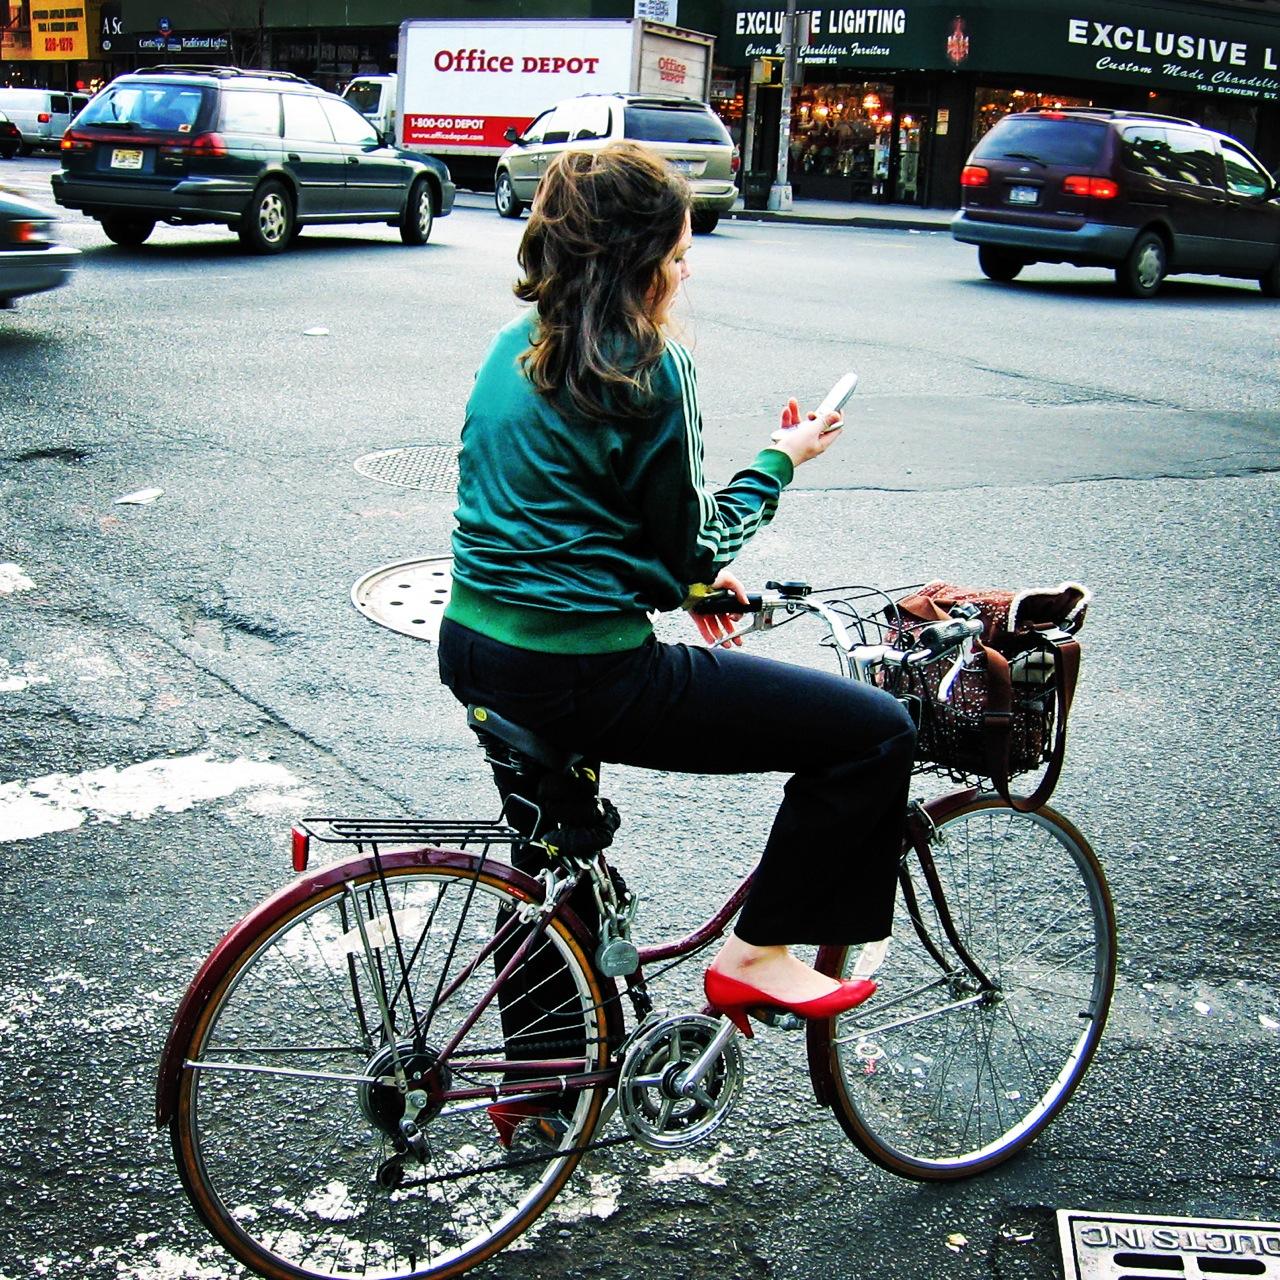 Biker looking at her phone?